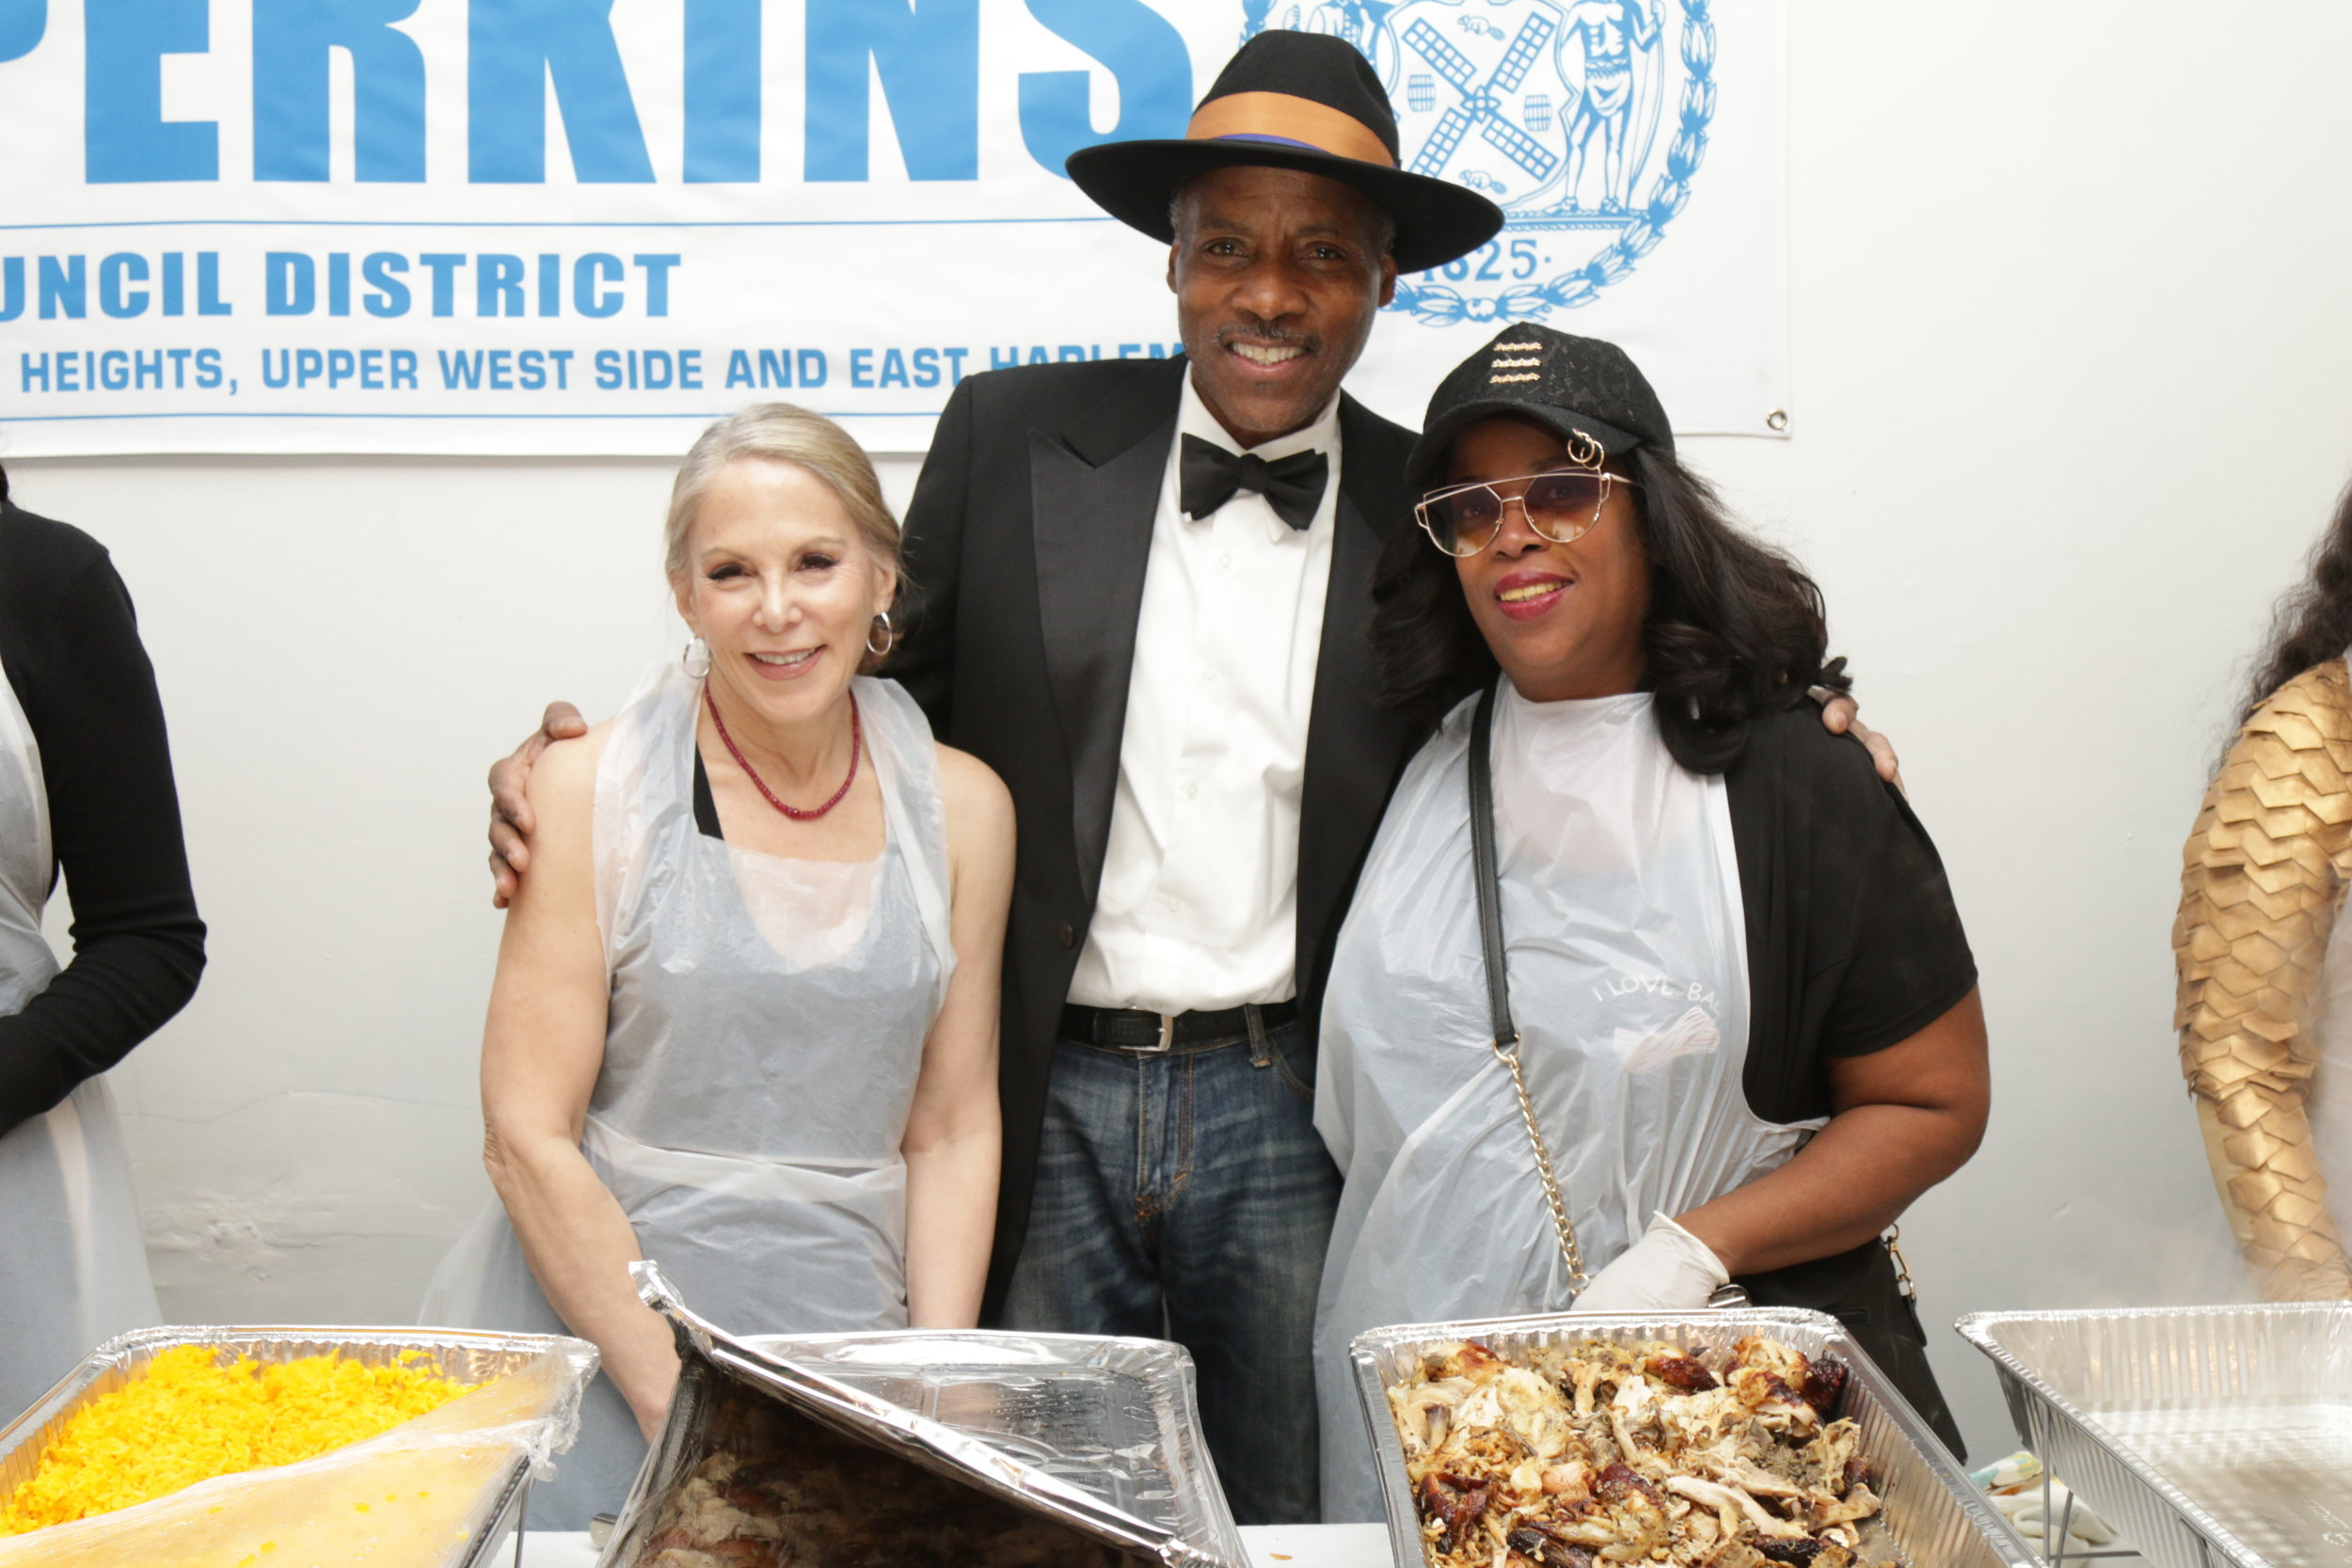 Sheri,Councilman Perkins and close friend Selene Breeden